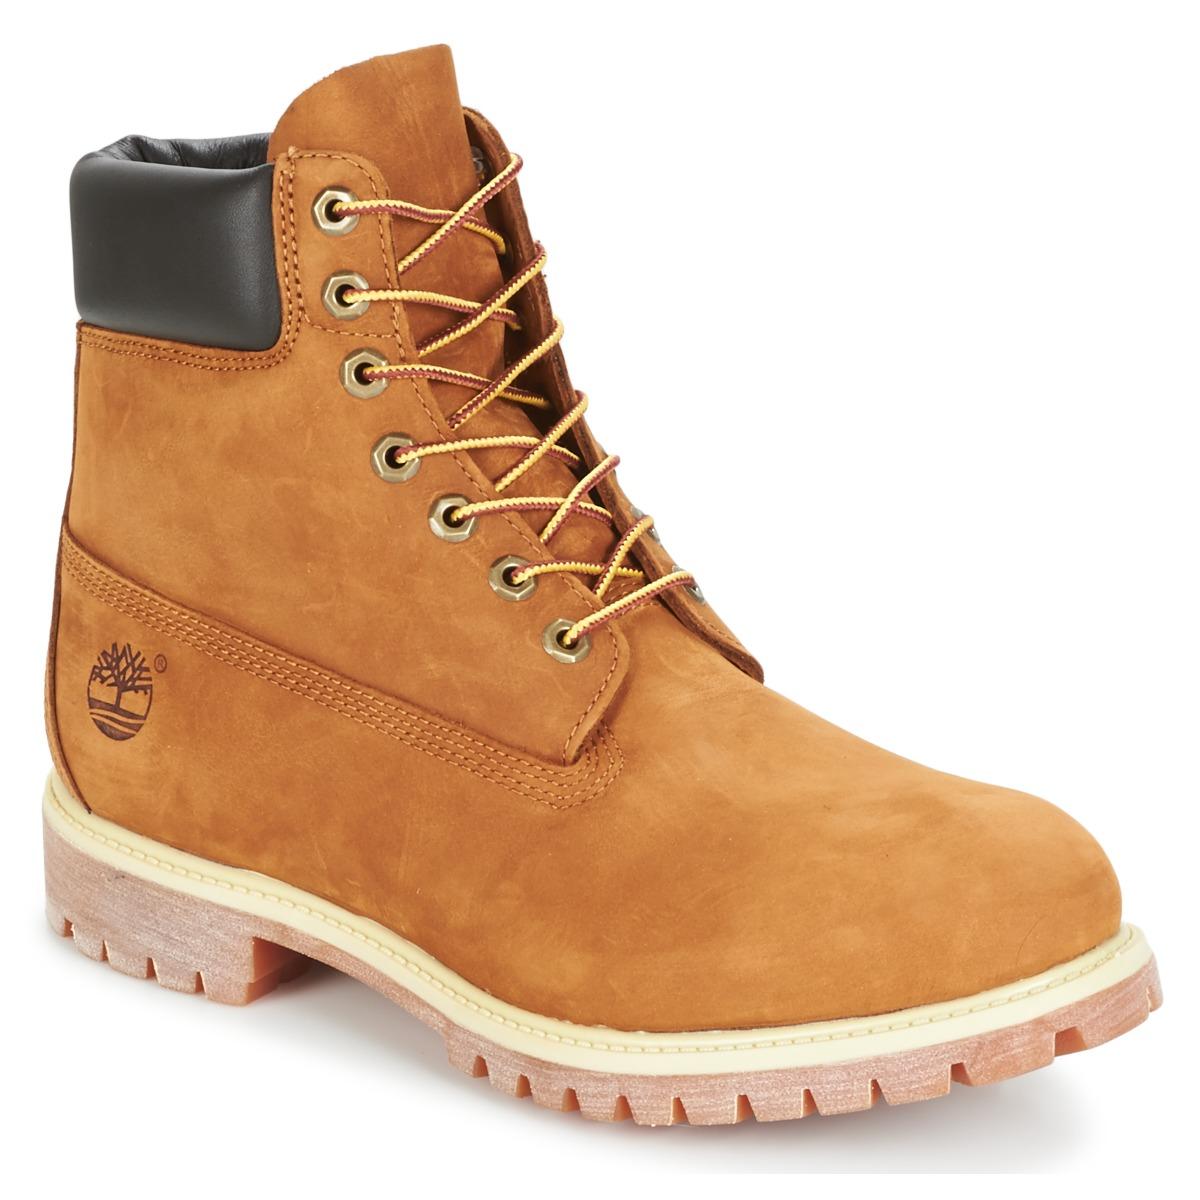 boots timberland 6 in premium boot marron livraison gratuite avec chaussures. Black Bedroom Furniture Sets. Home Design Ideas